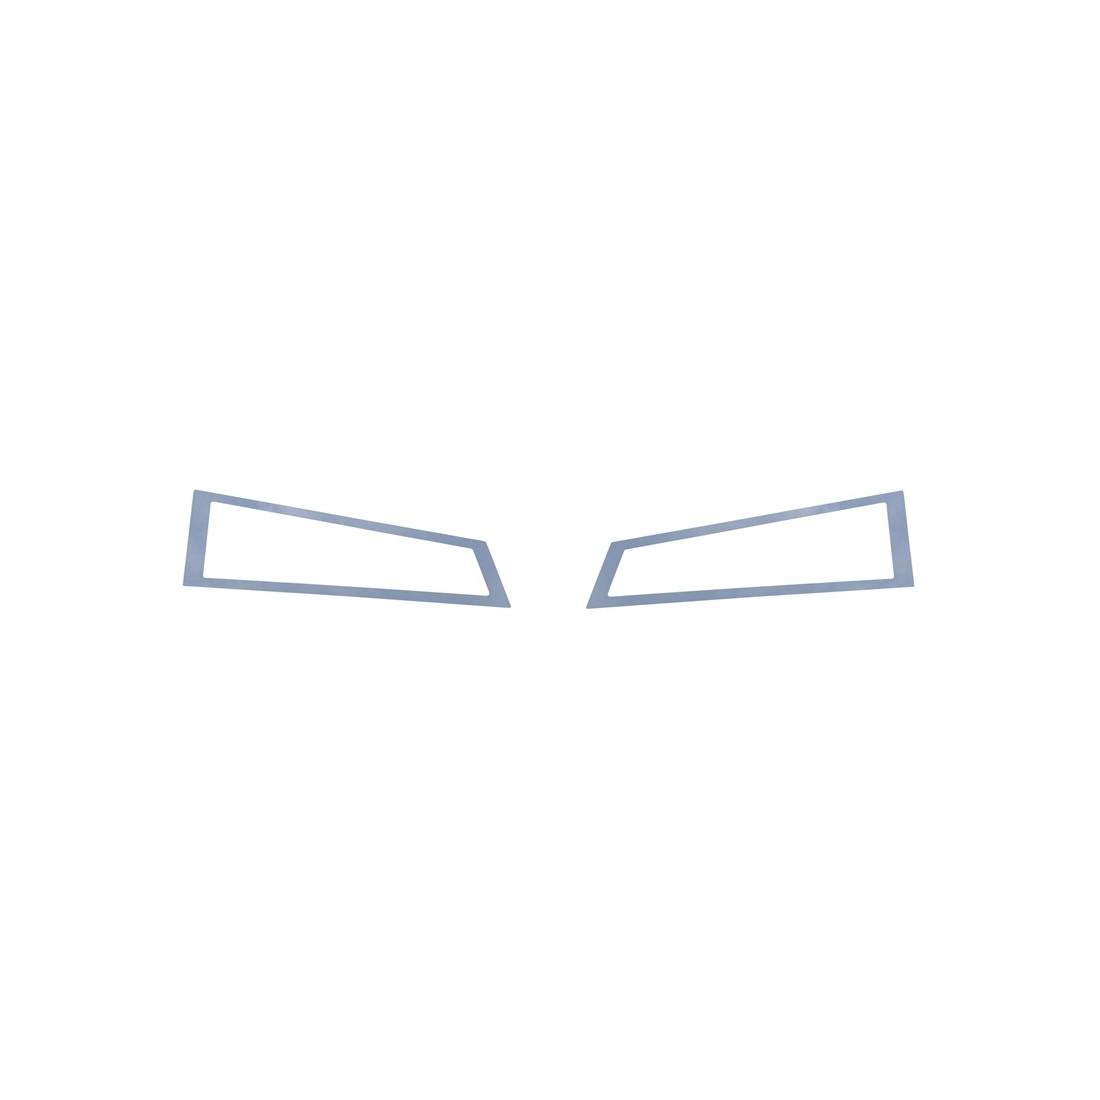 VOLVO FH 4 down light stainless frame chrome